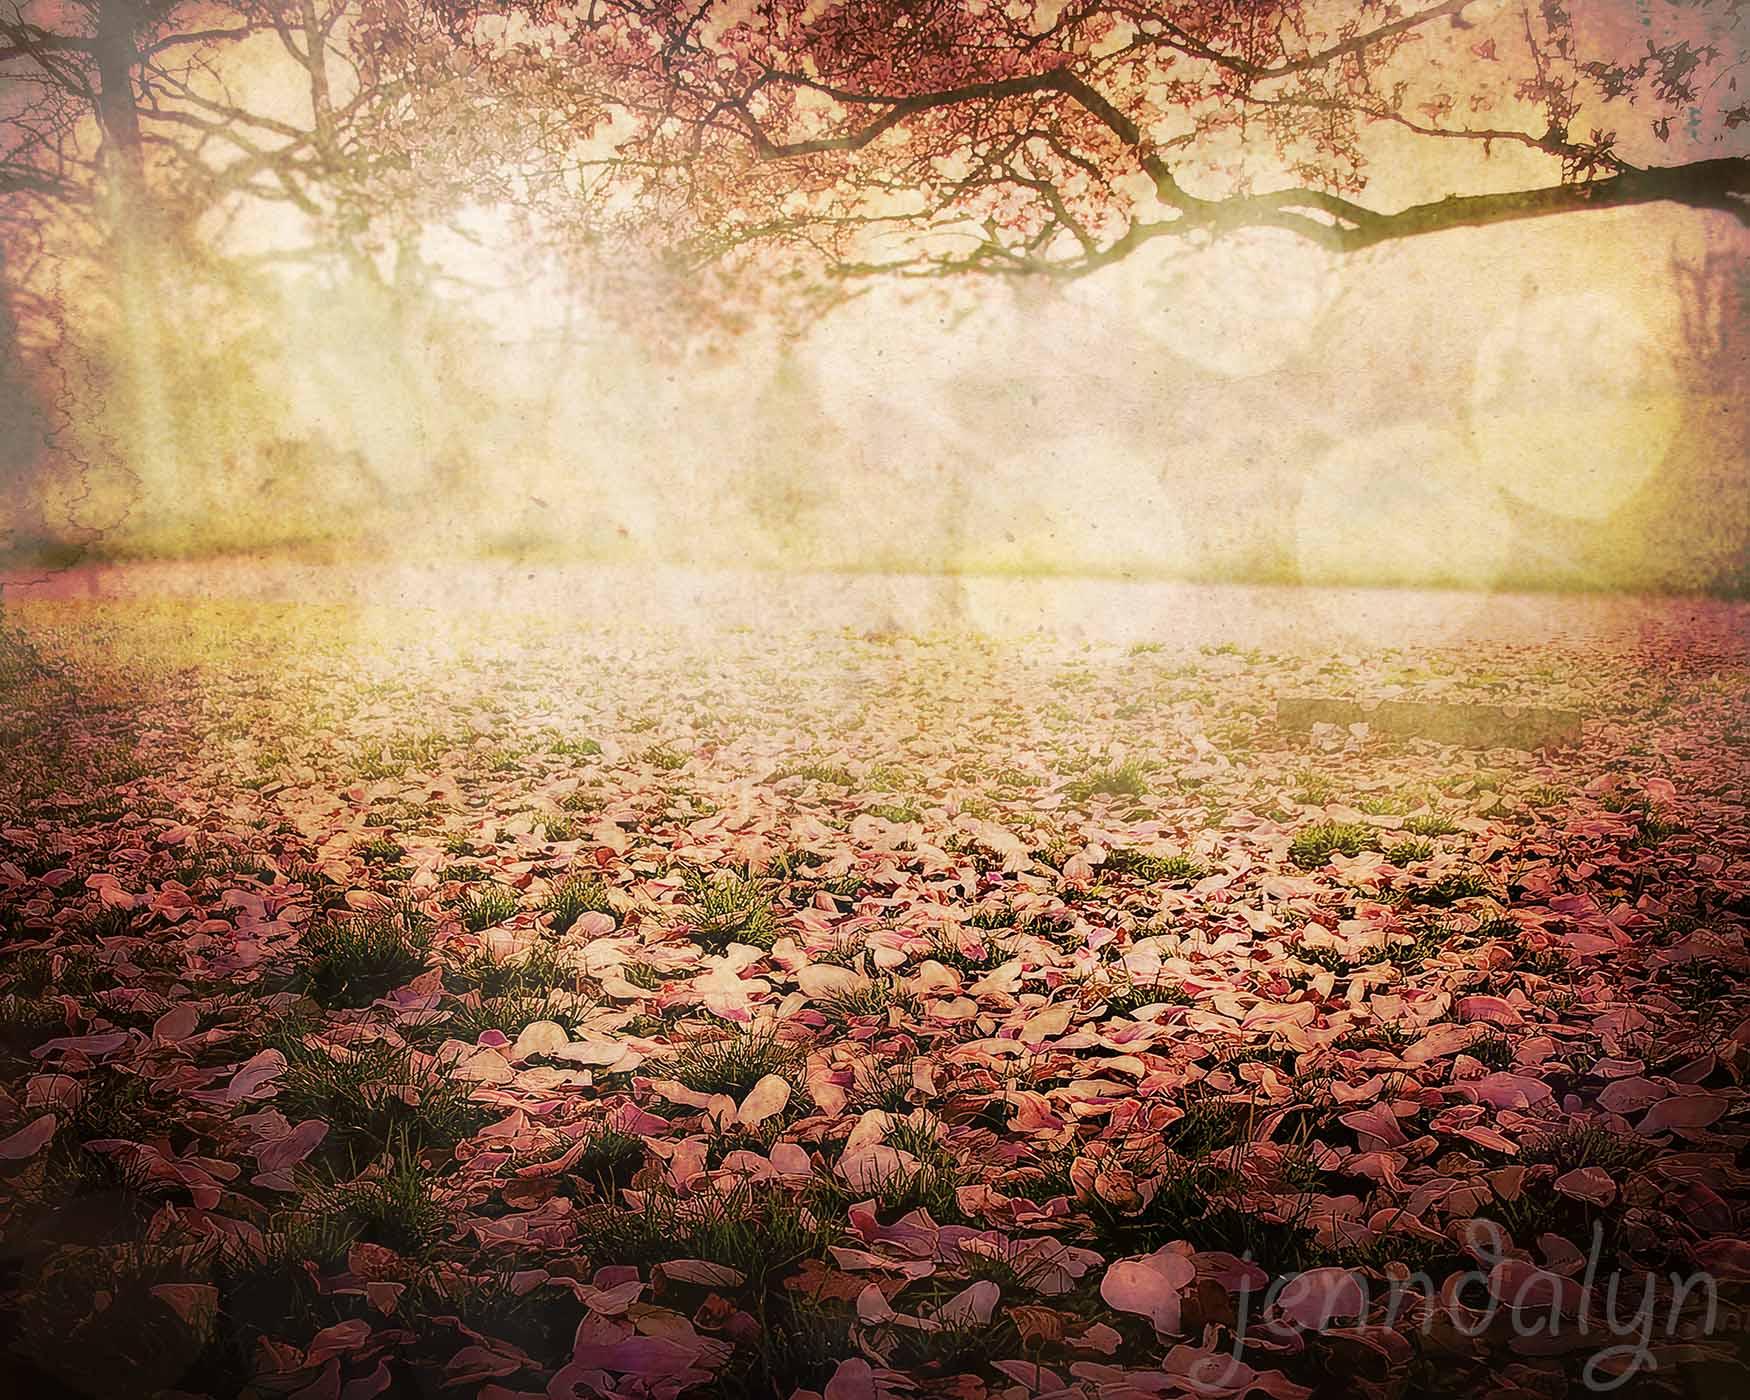 I Awoke In A Dream - 8 x 10 fine art photograph, spring landscape ...